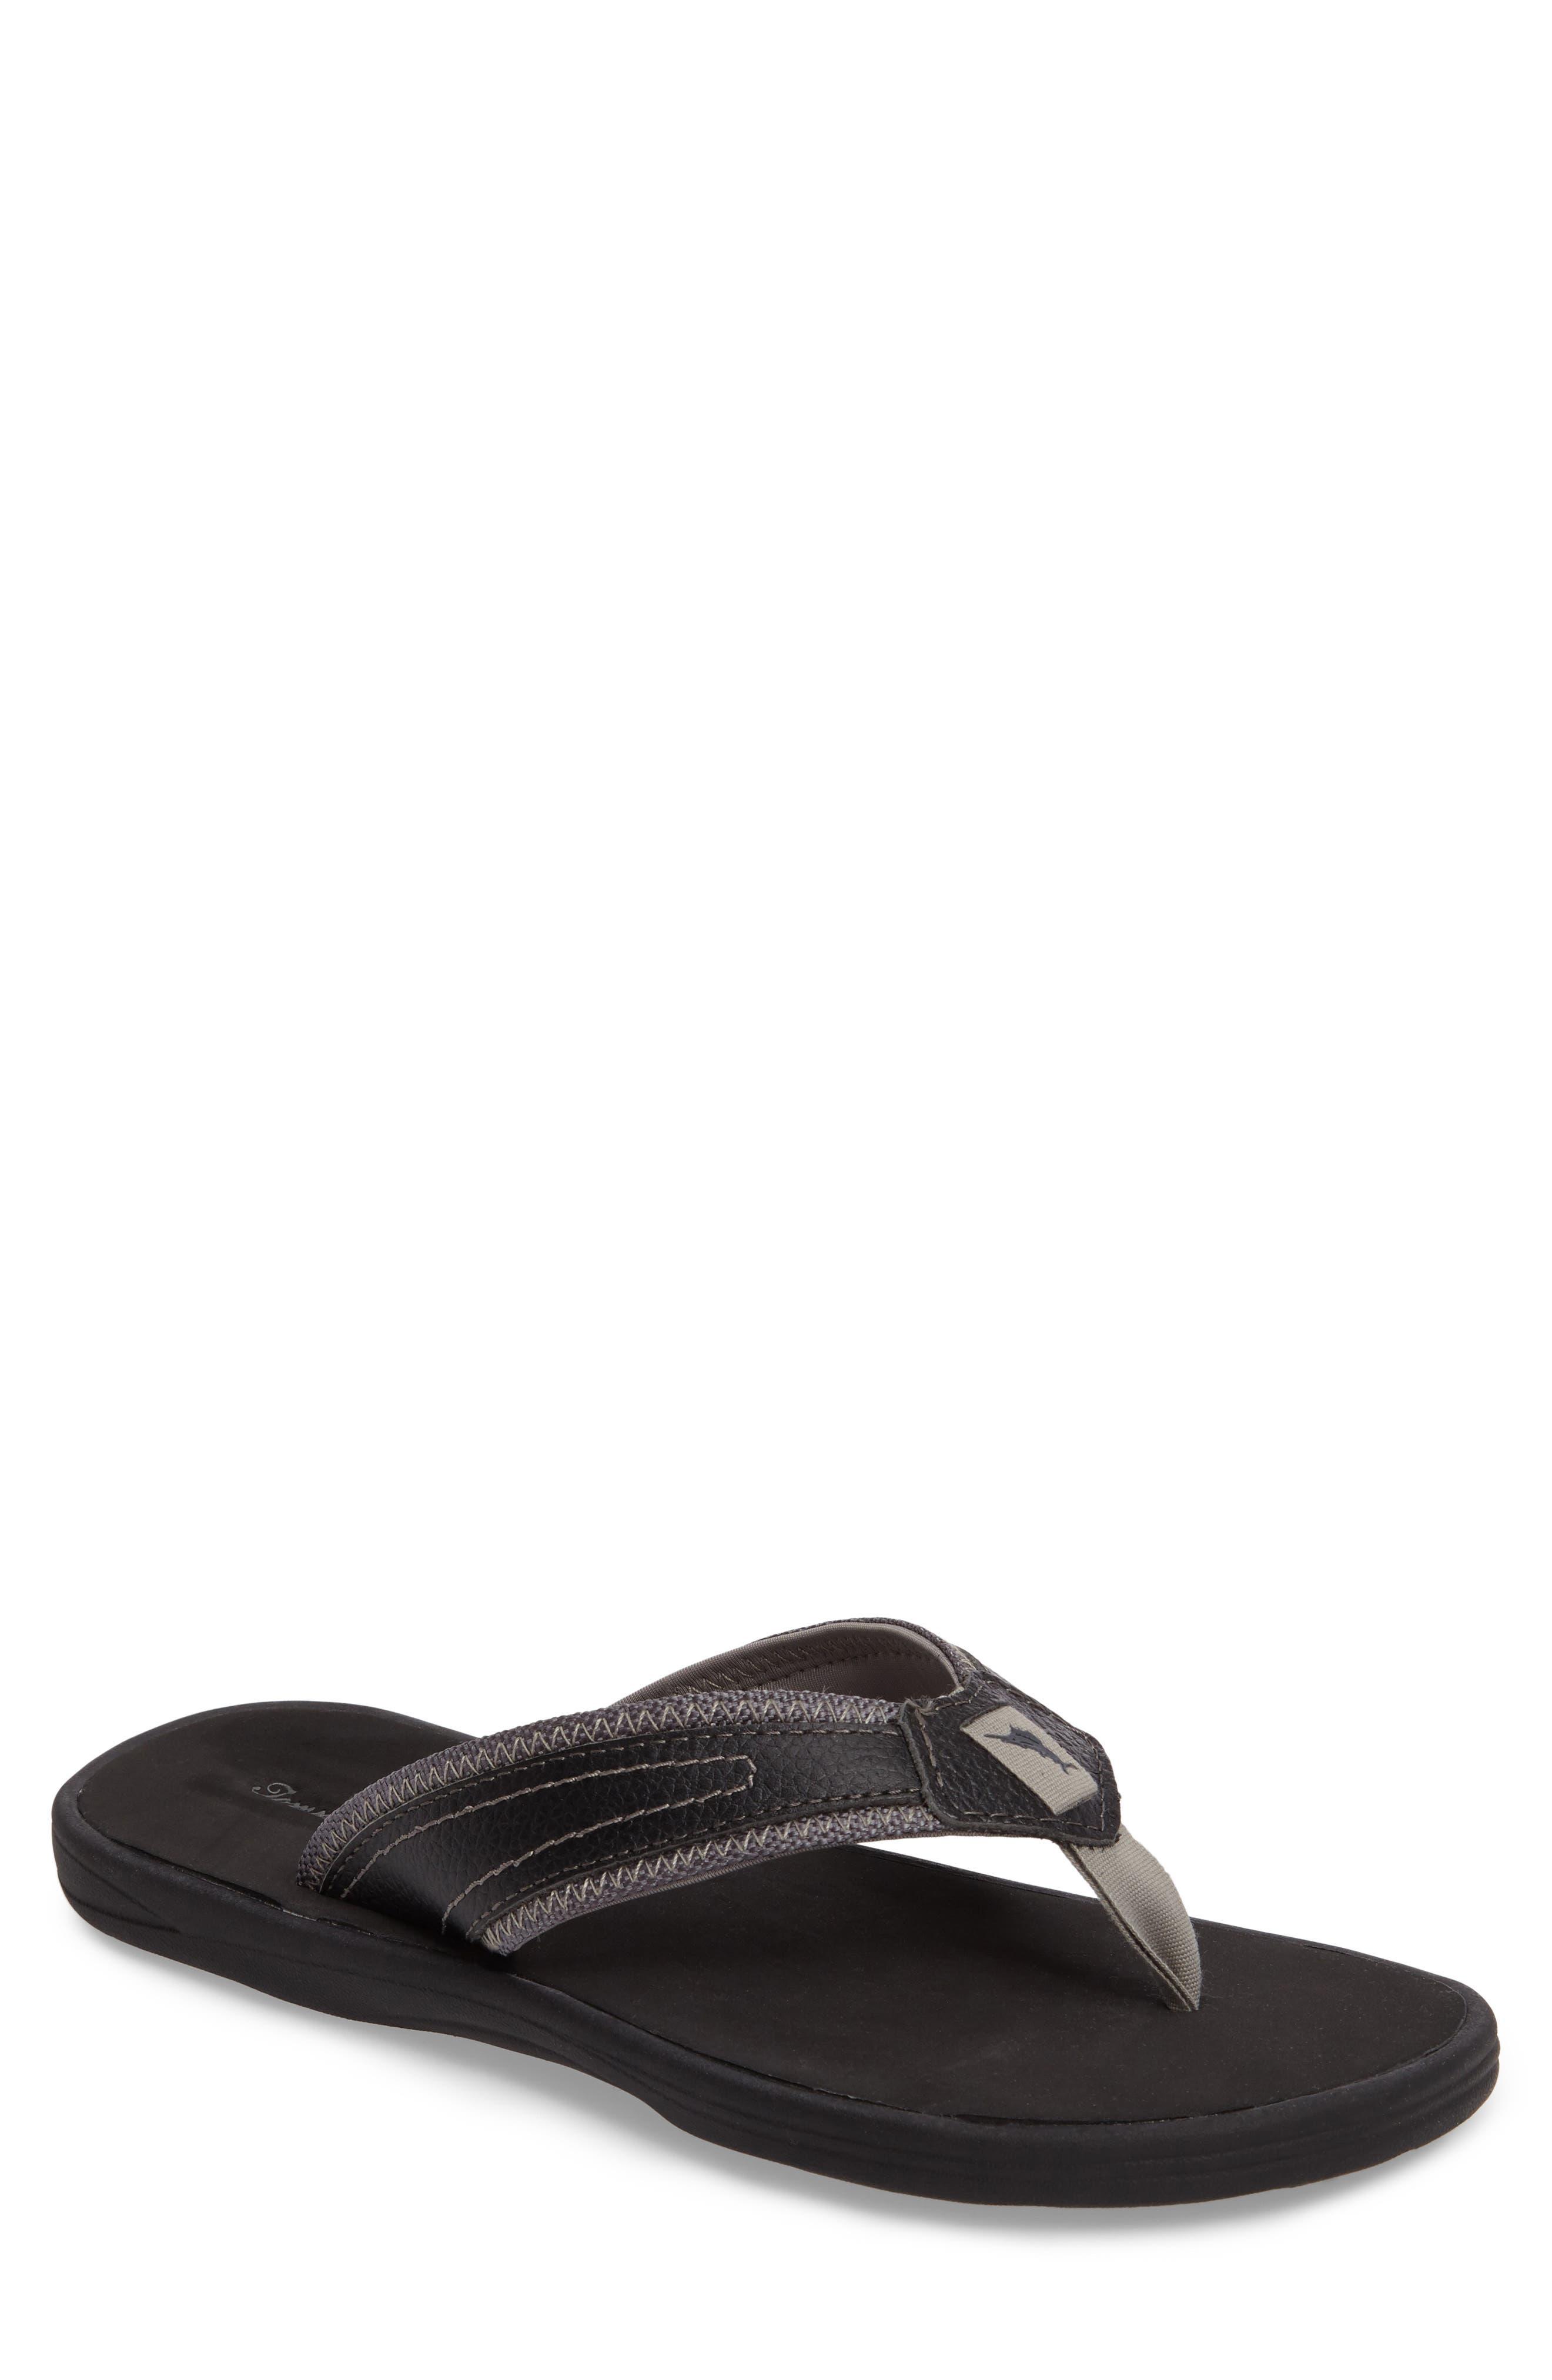 Seawell Flip Flop,                         Main,                         color,